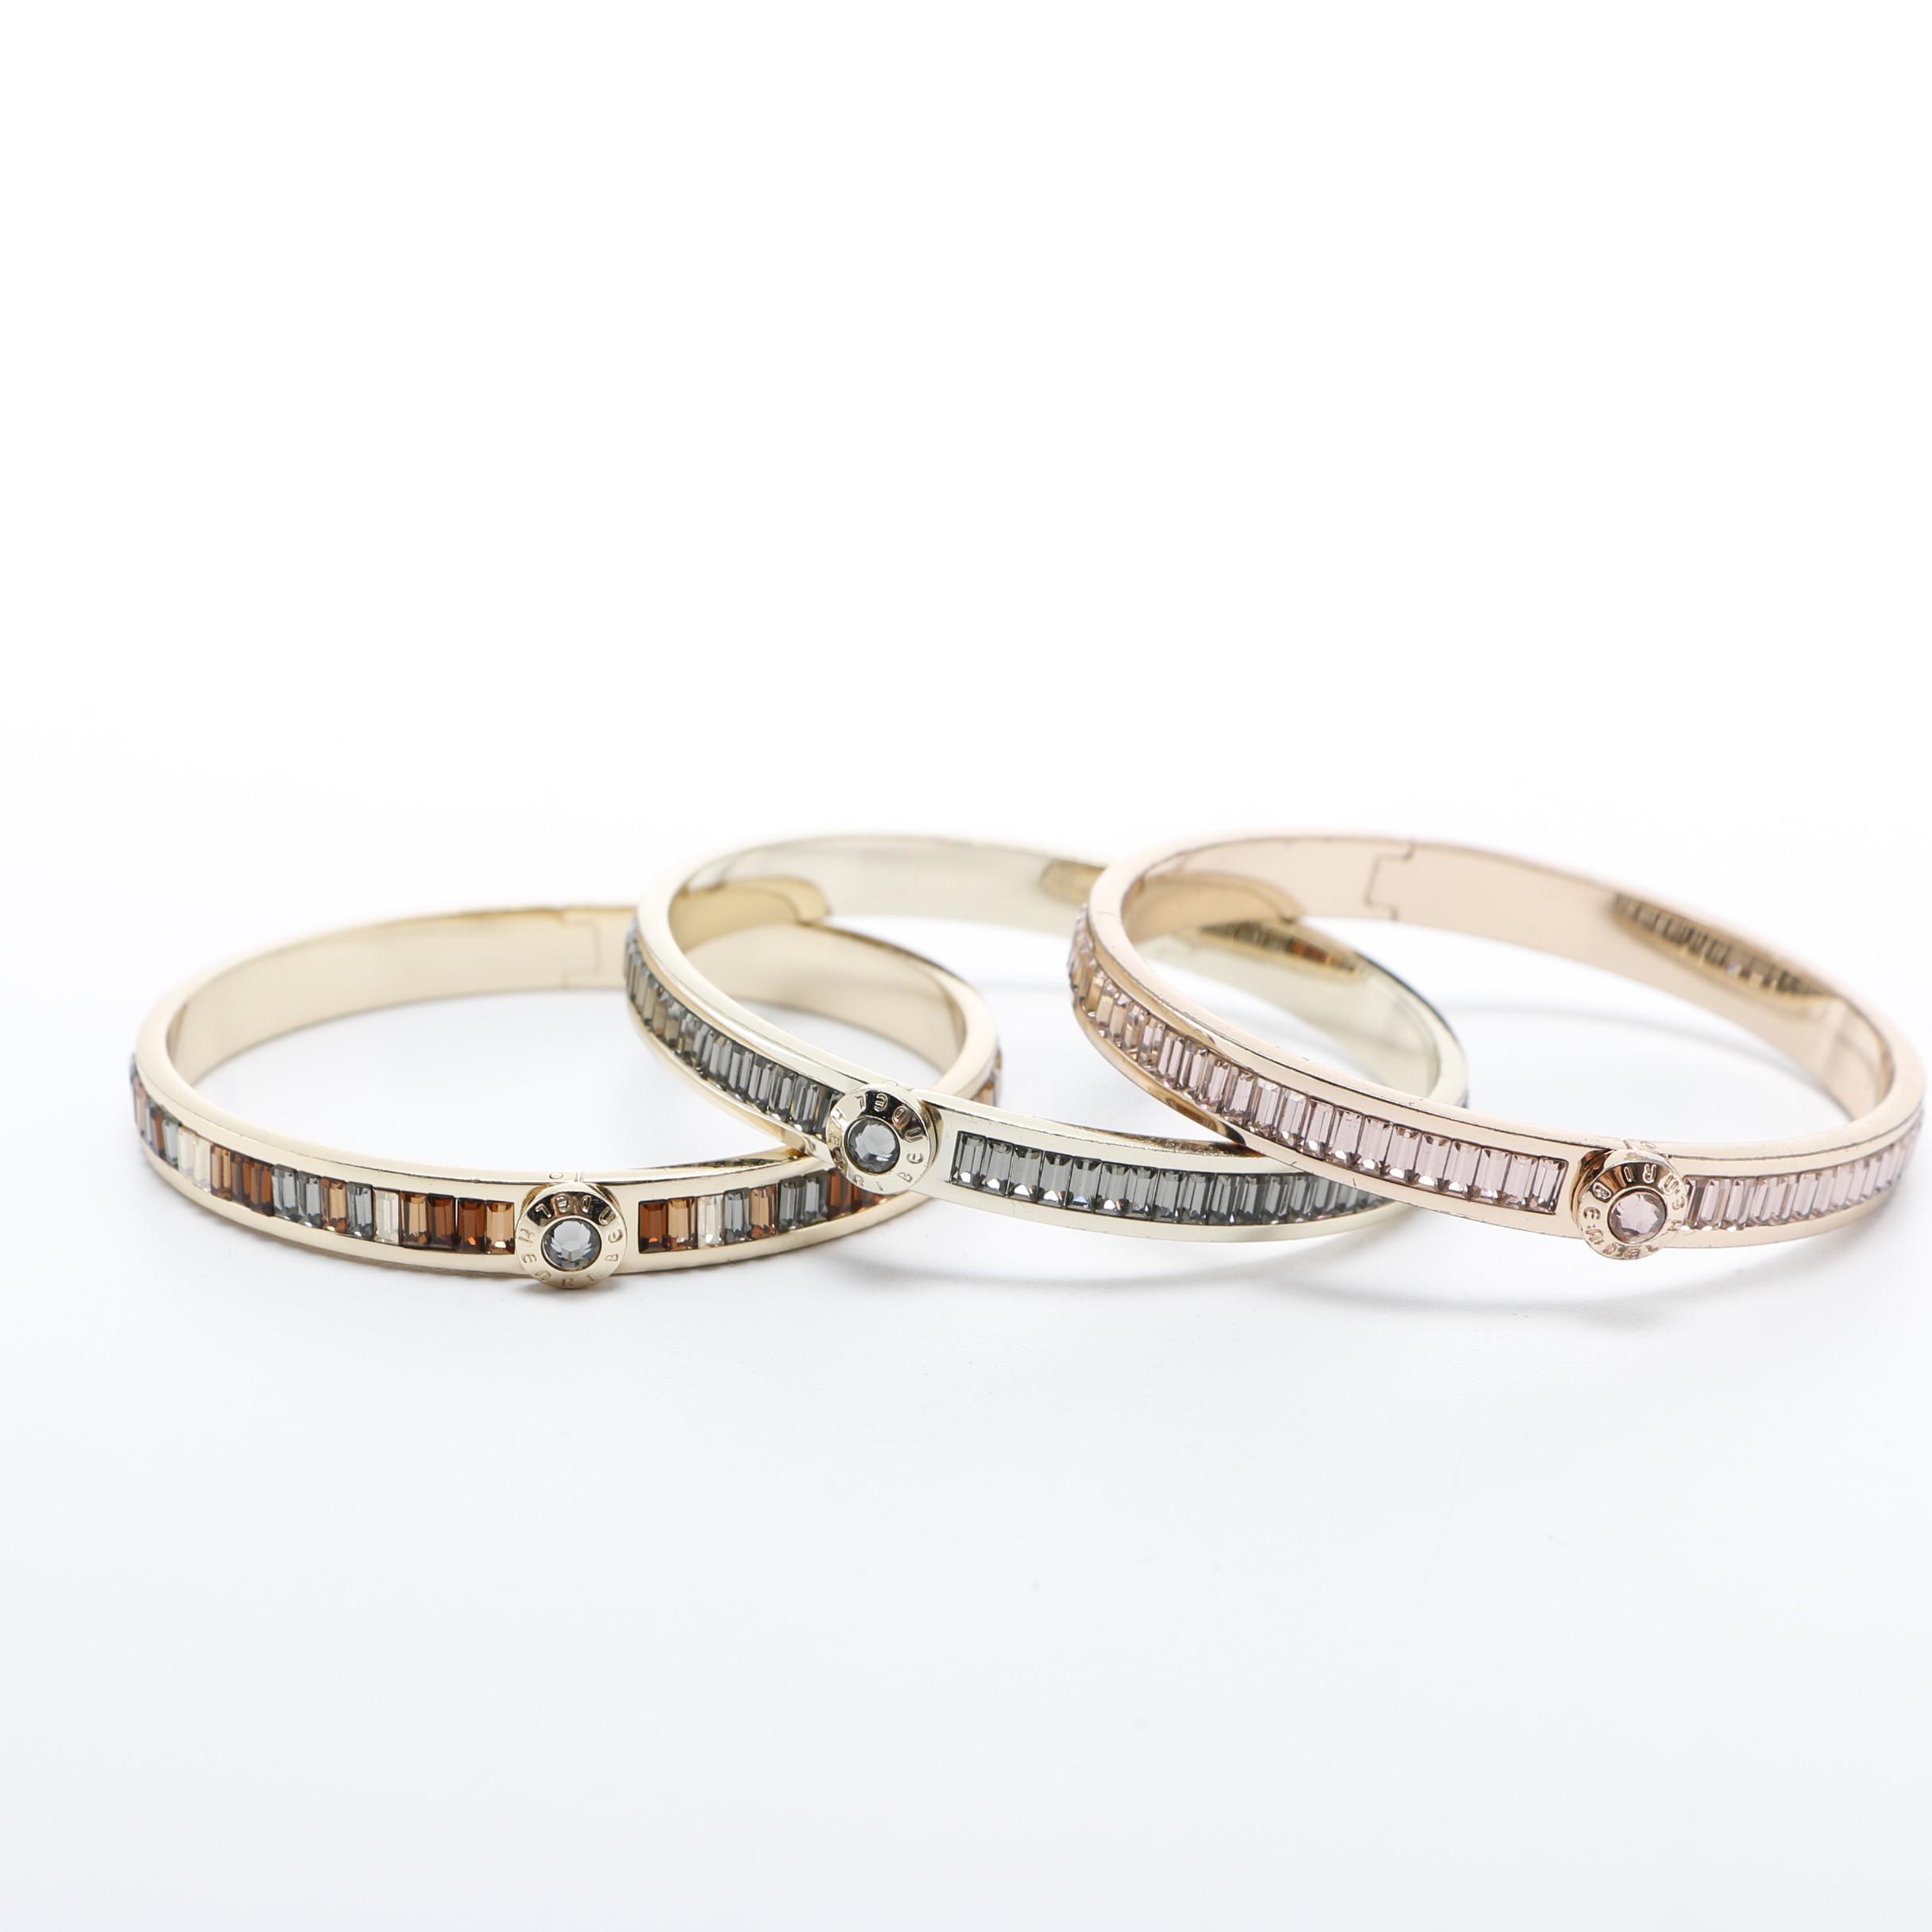 Three Henri Bendel The Harry Bangle Bracelets Ebth